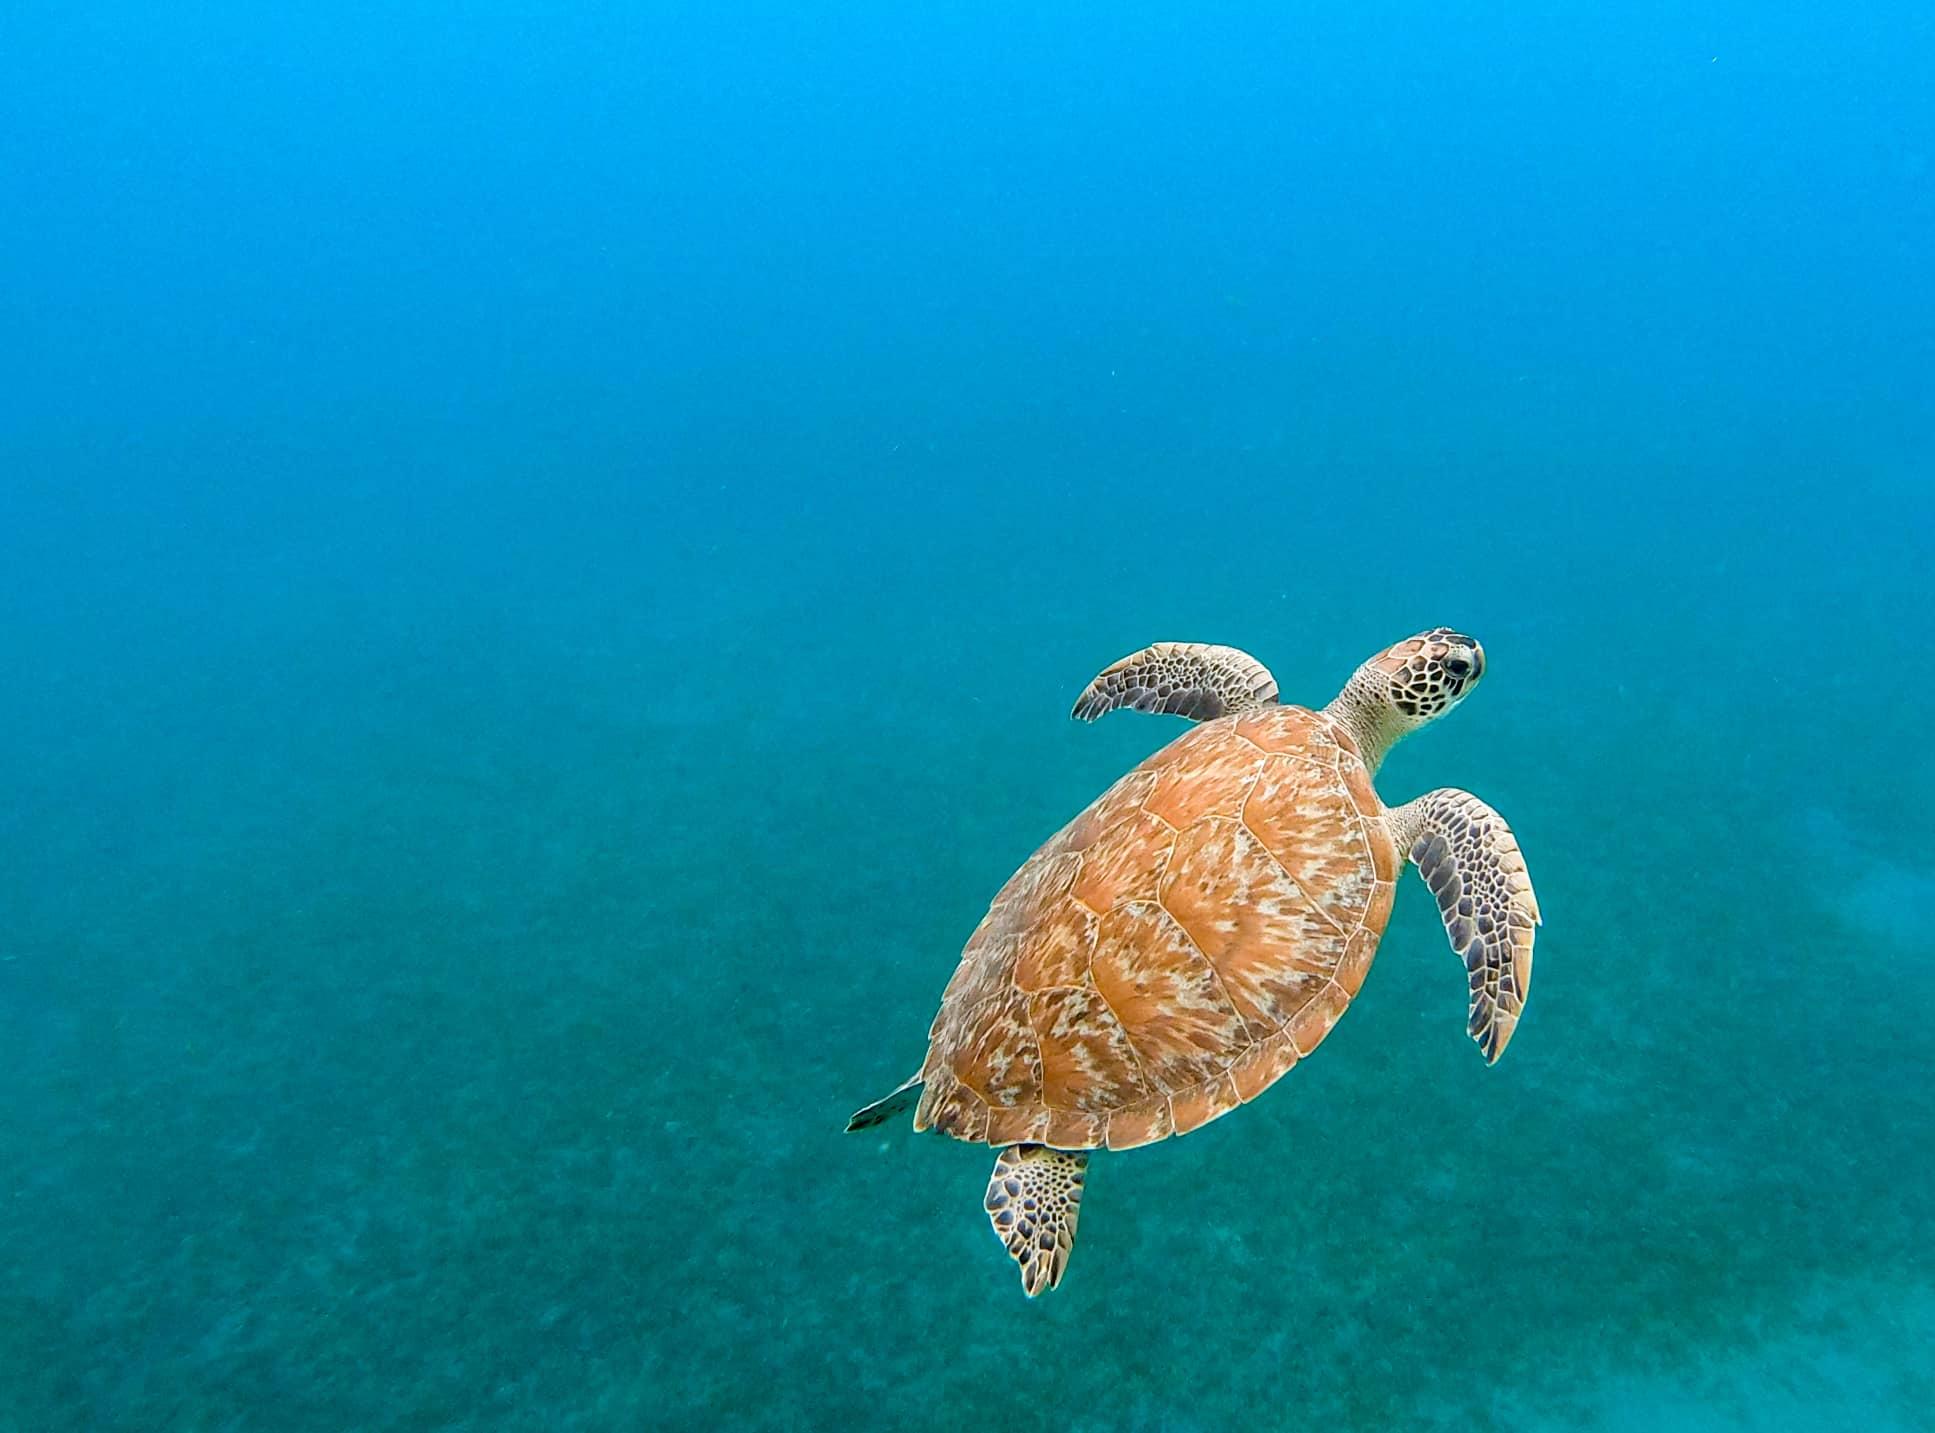 plongée-tortue-ilet-pigeon-reserve-cousteau-basse-terre-guadeloupe